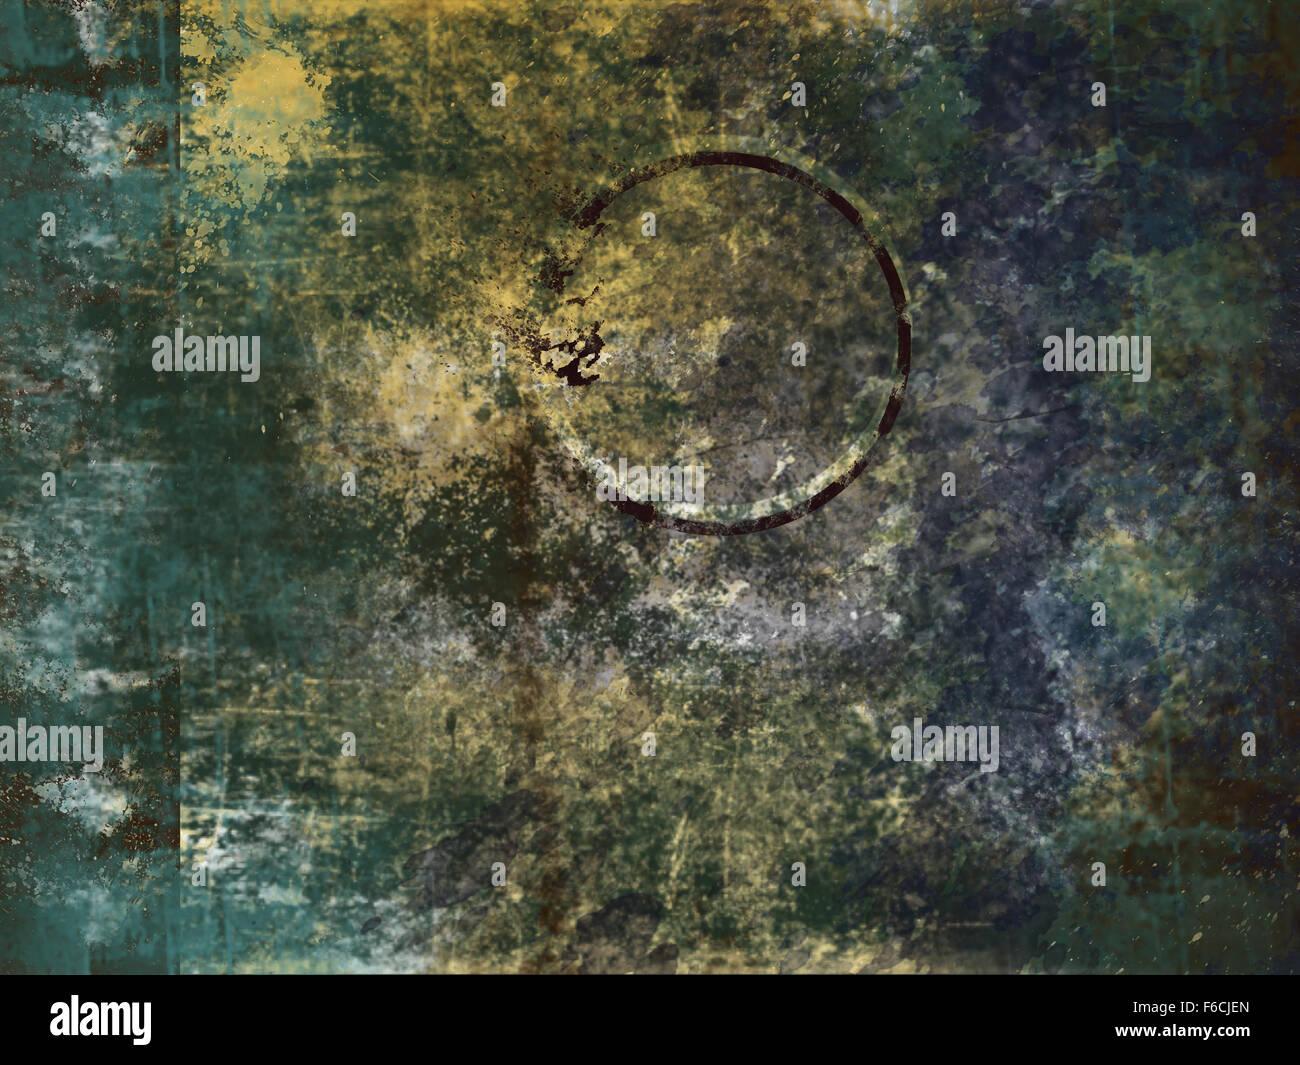 High resolution grunge texture background - Stock Image